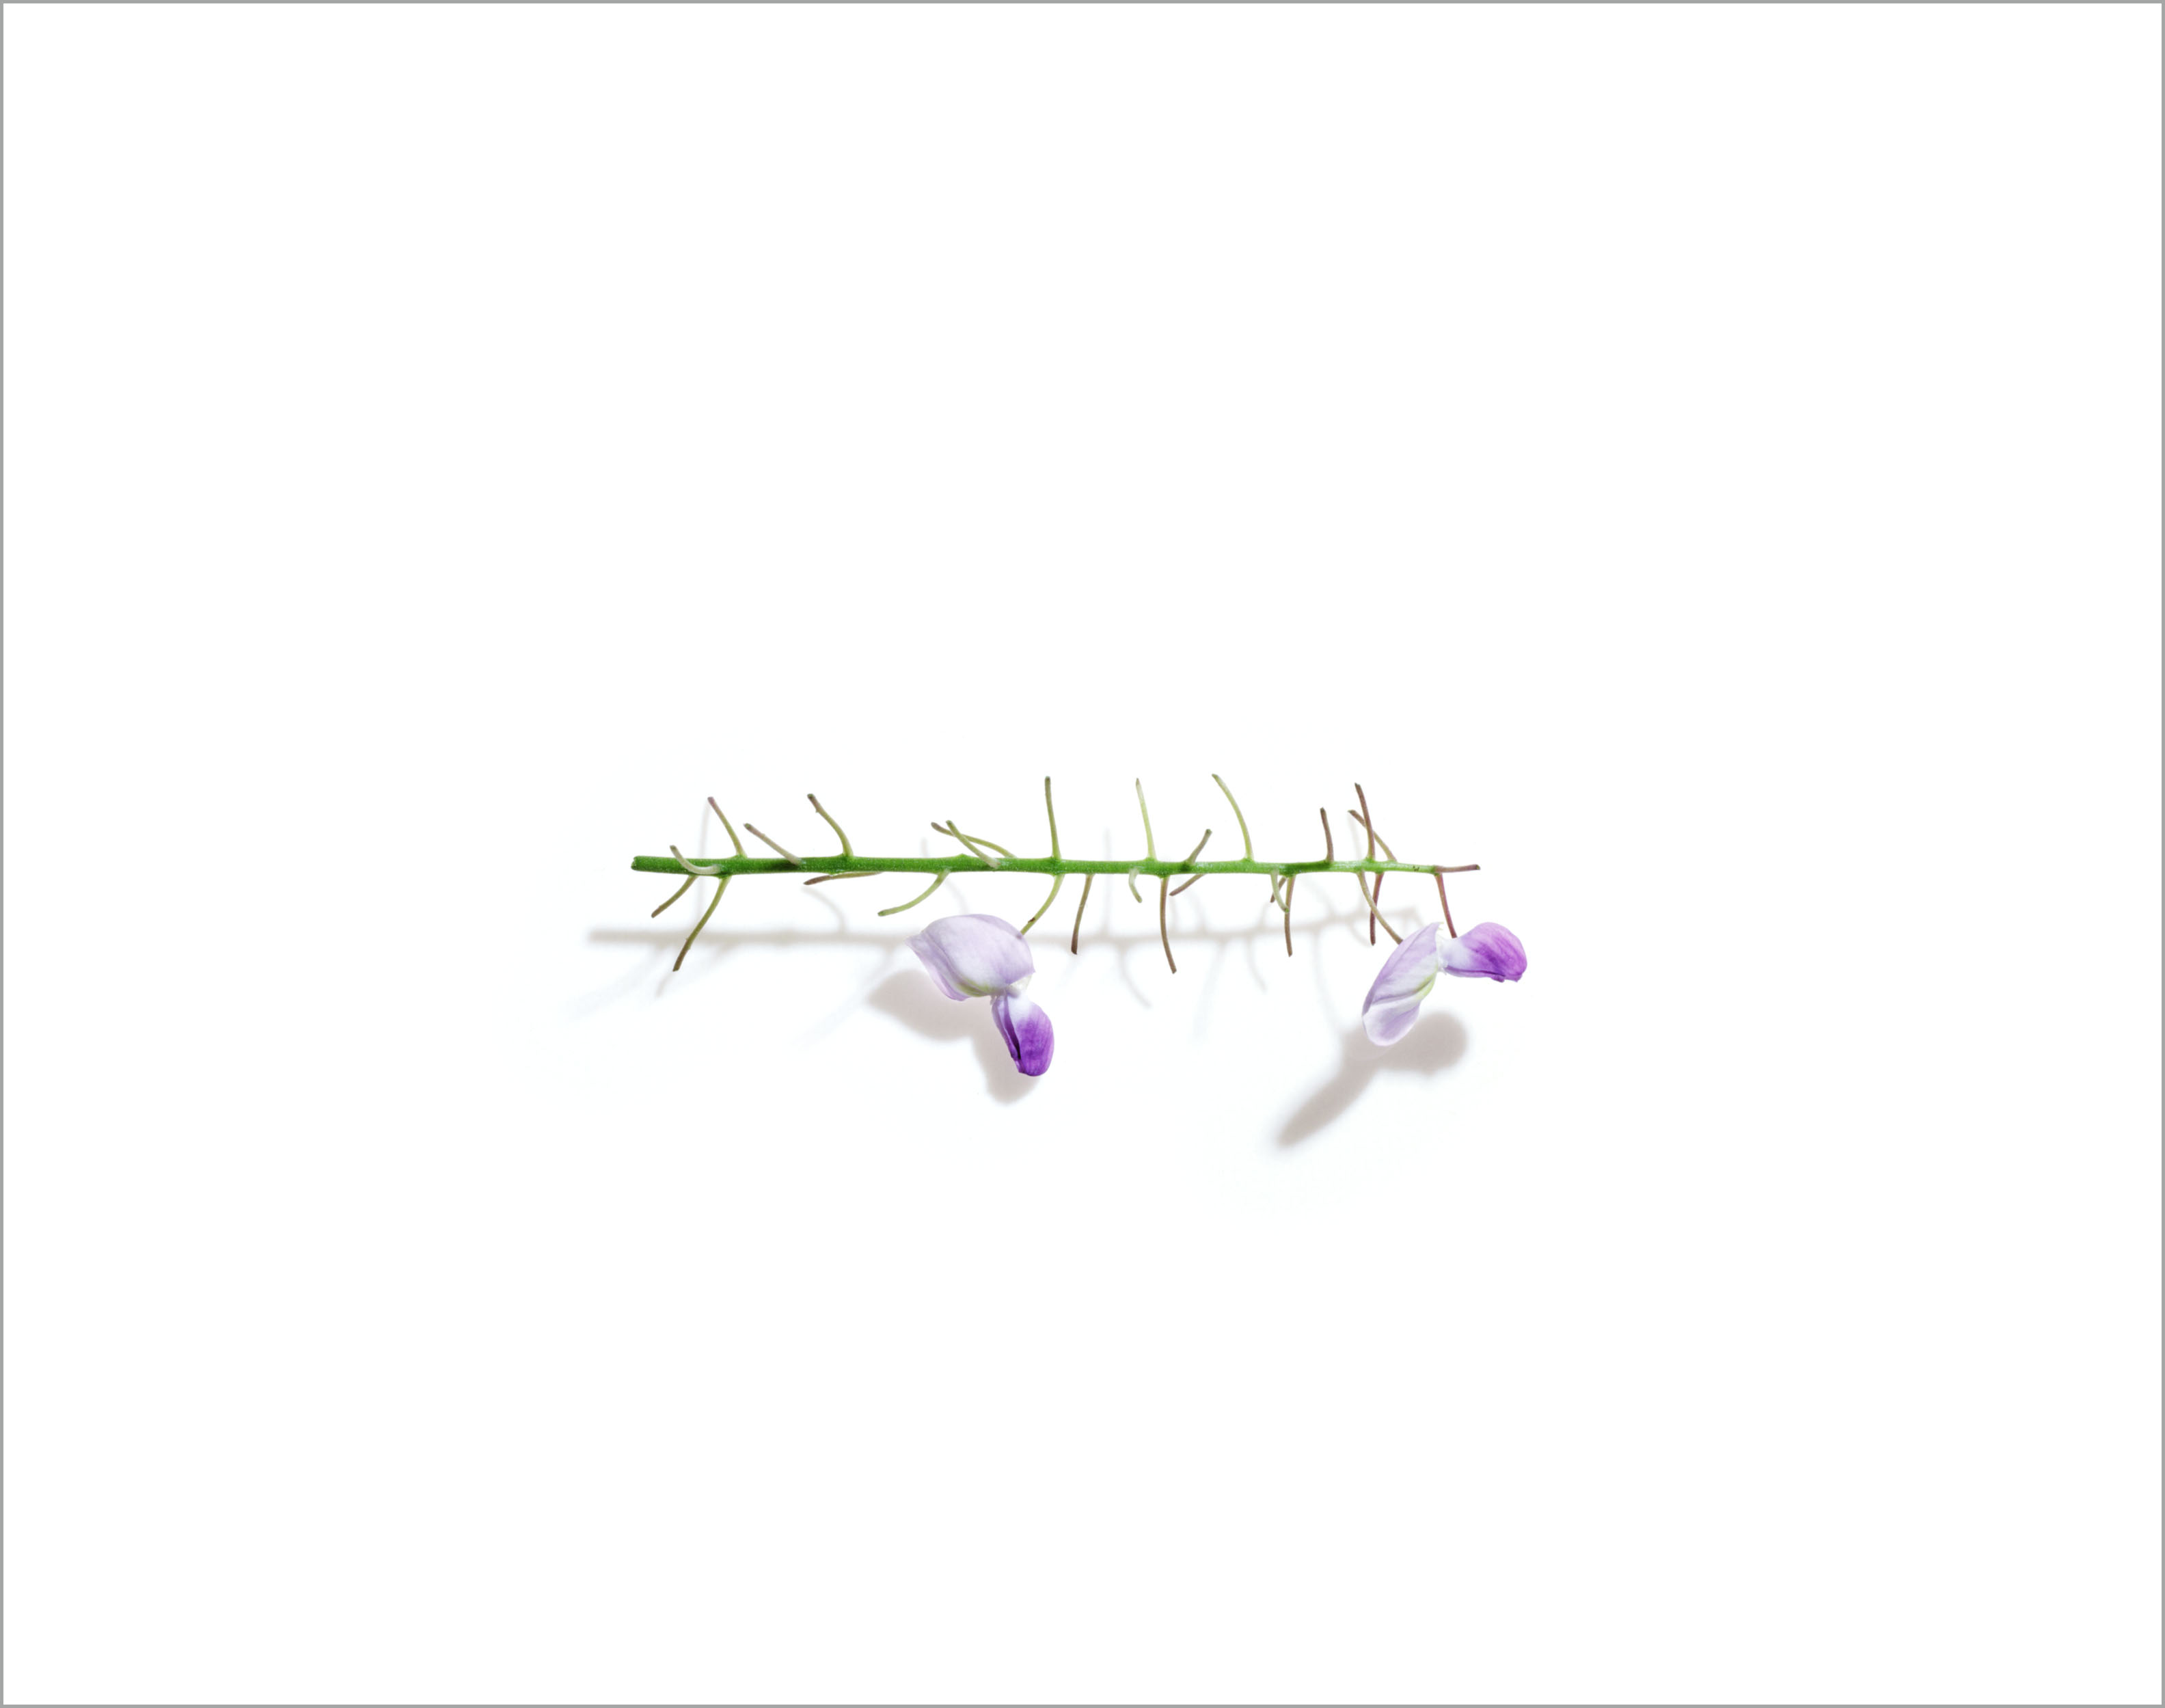 003_flora